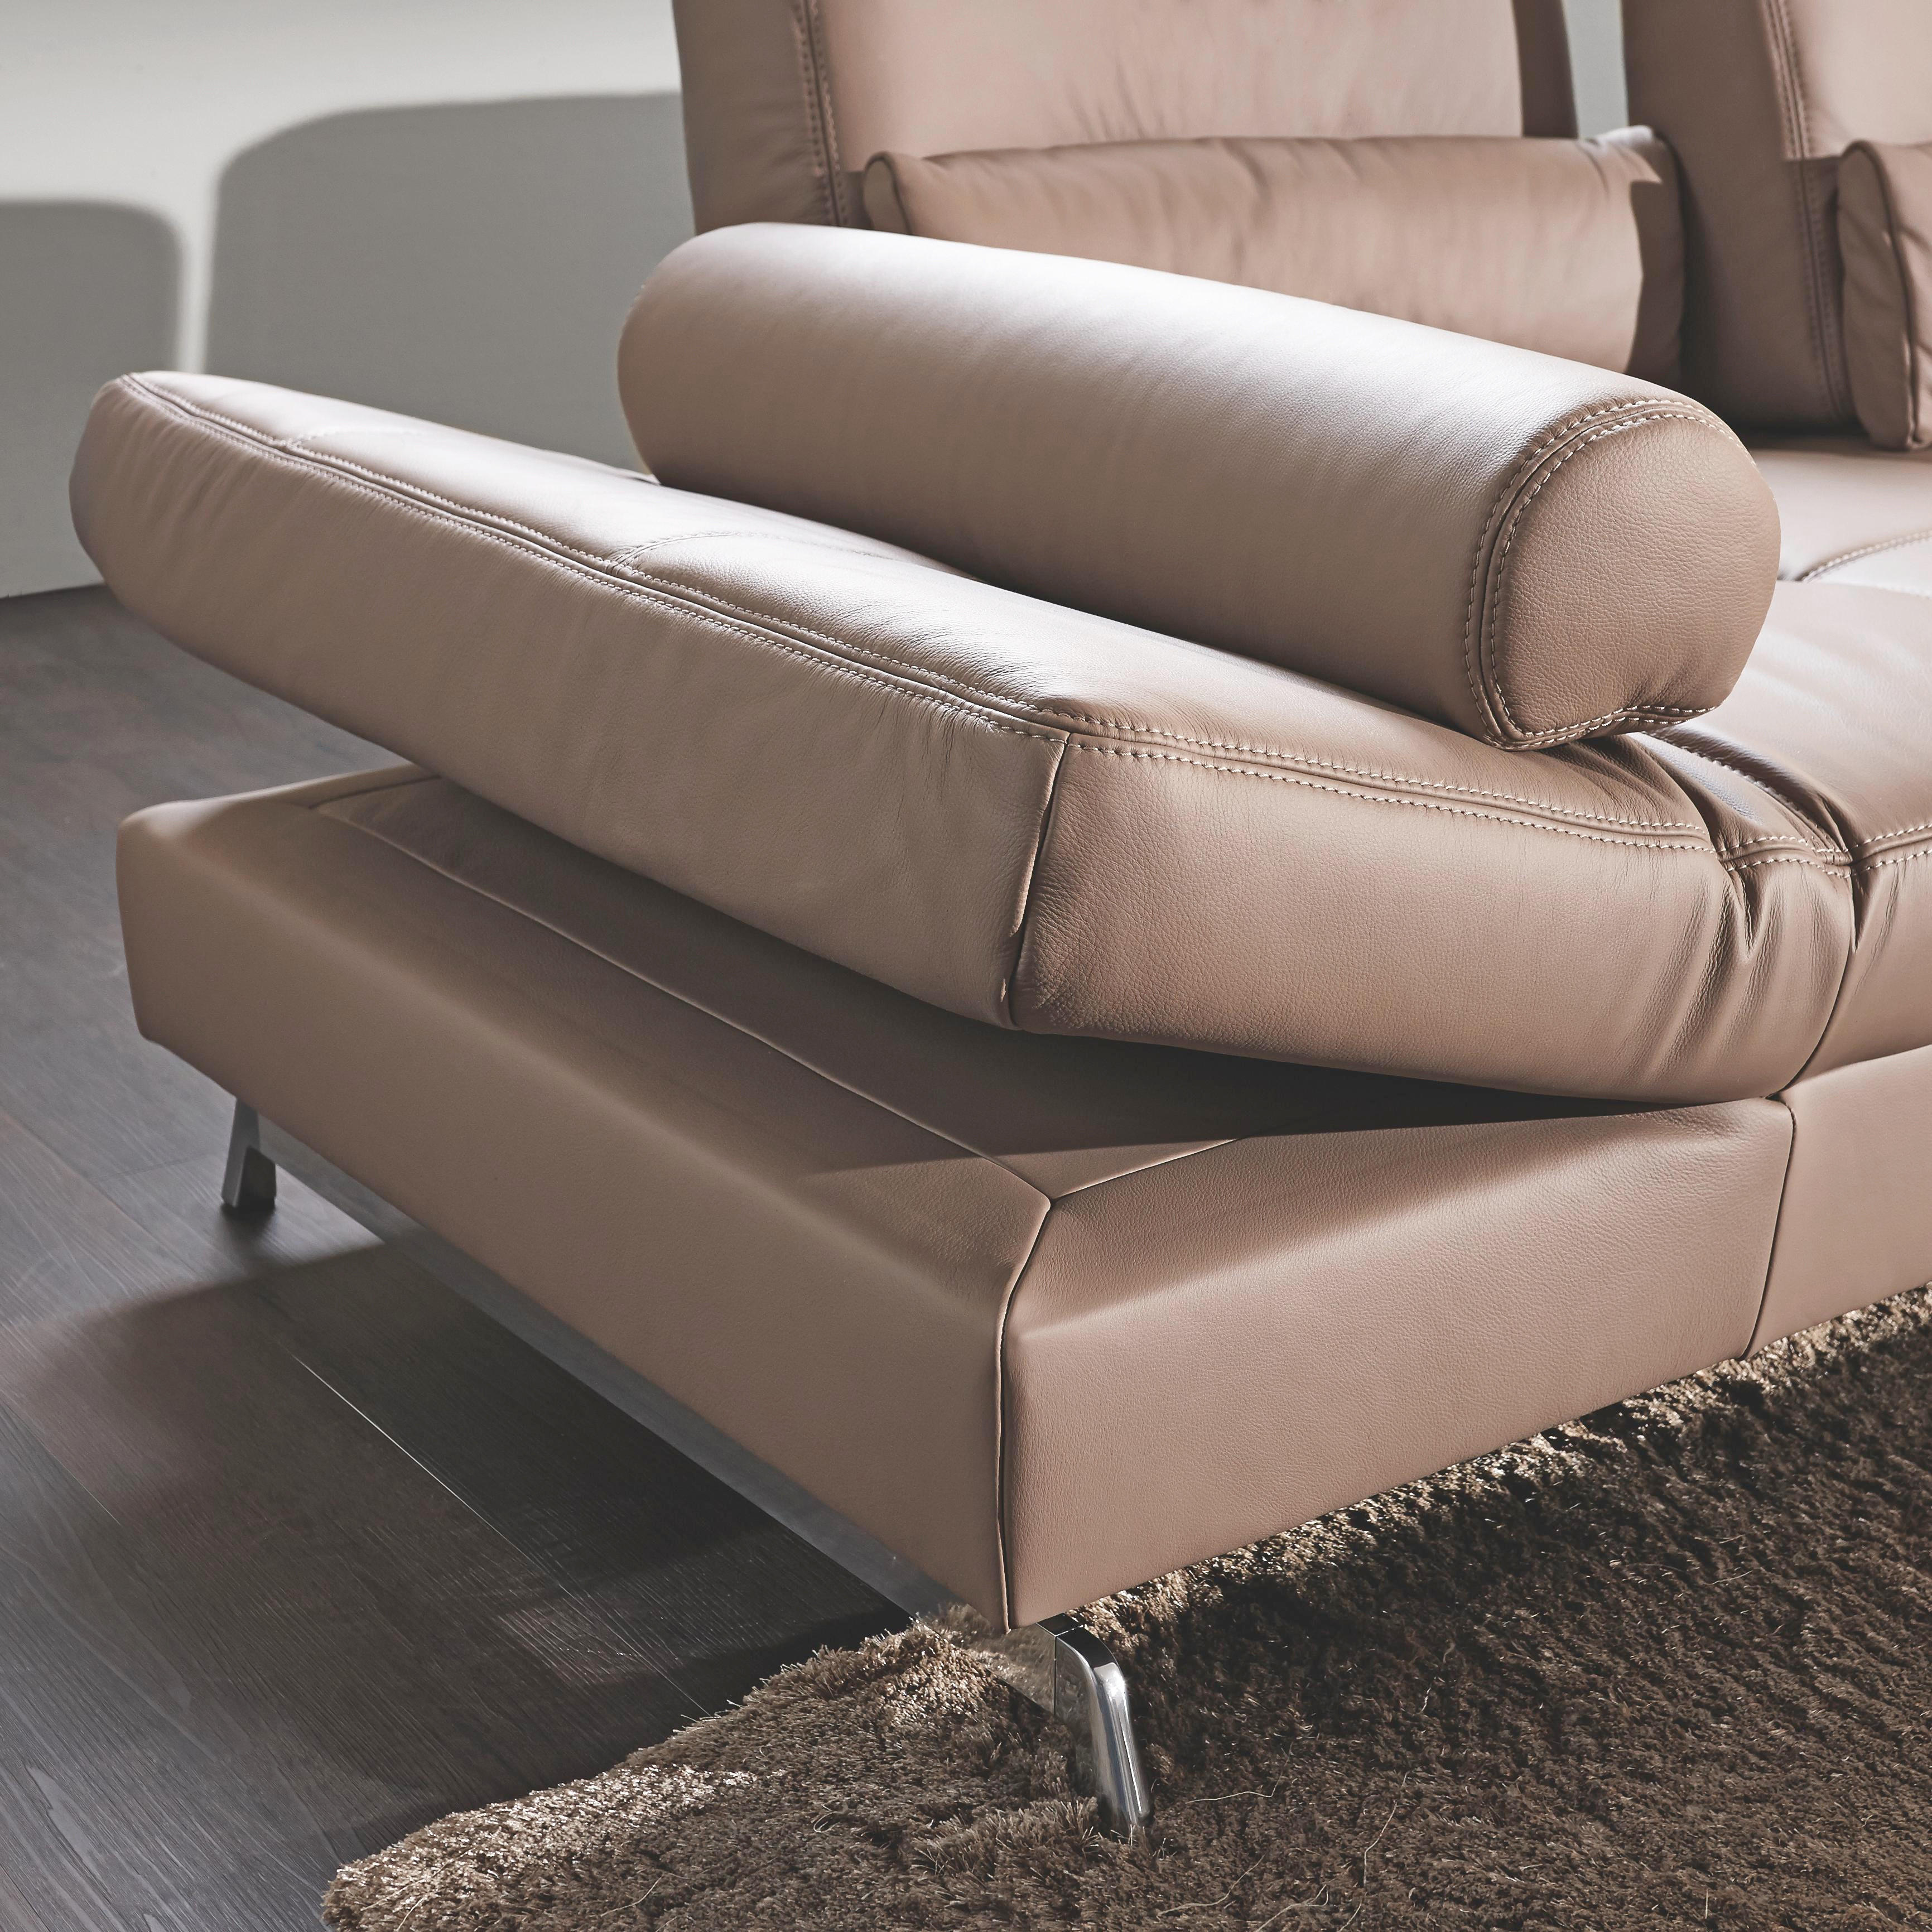 WOHNLANDSCHAFT Echtleder - Alufarben/Braun, Design, Leder/Metall (299/250cm) - JOOP!